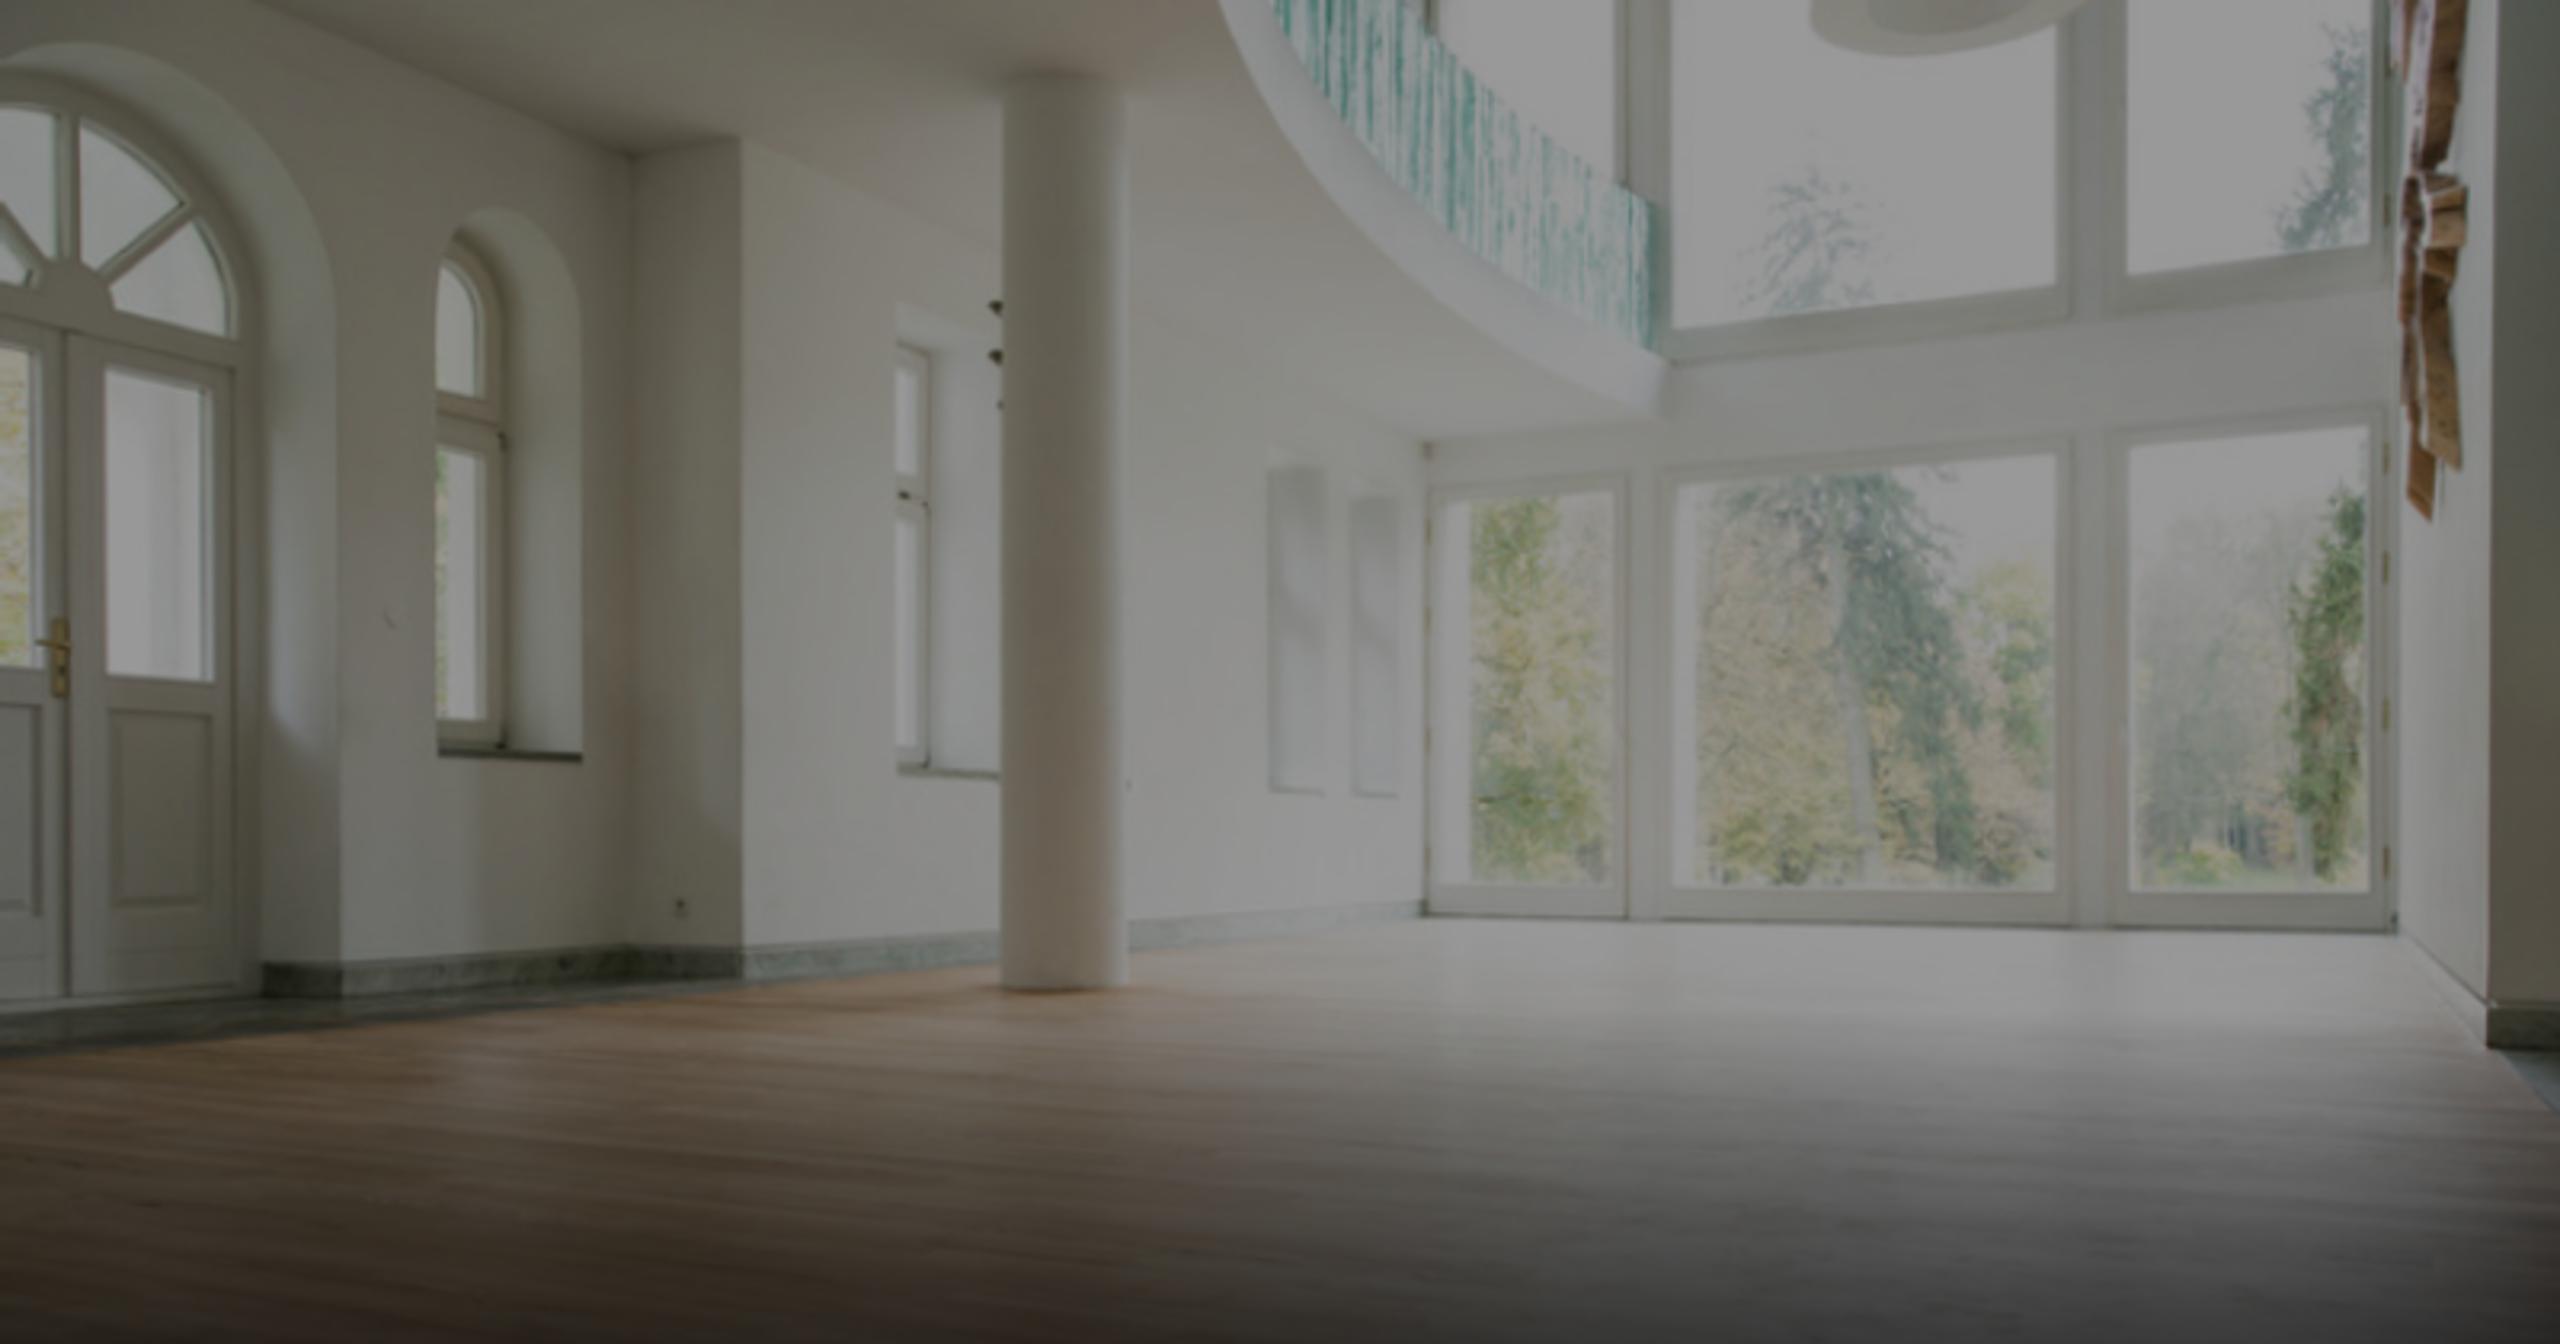 5 Popular Flooring Options